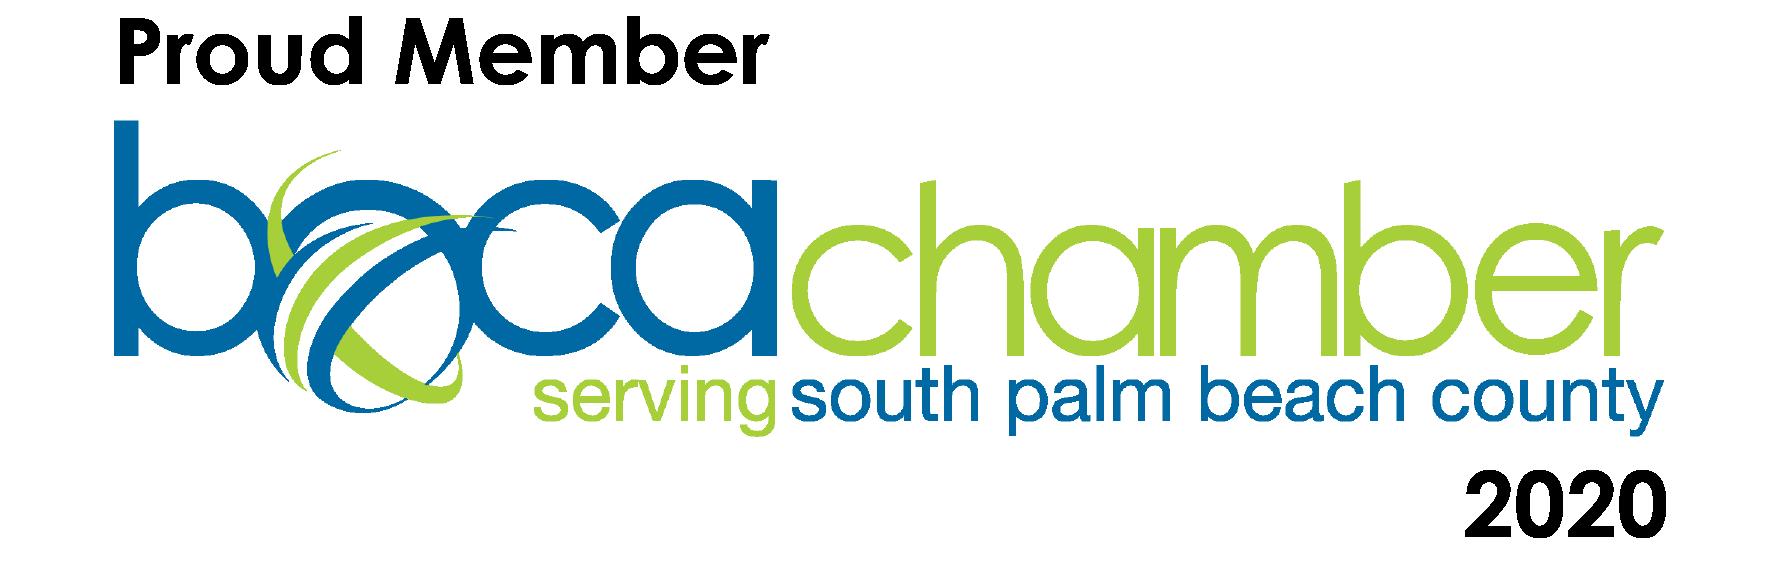 Sign Partners - Boca Raton Chamber of Commerce Proud Member 2020